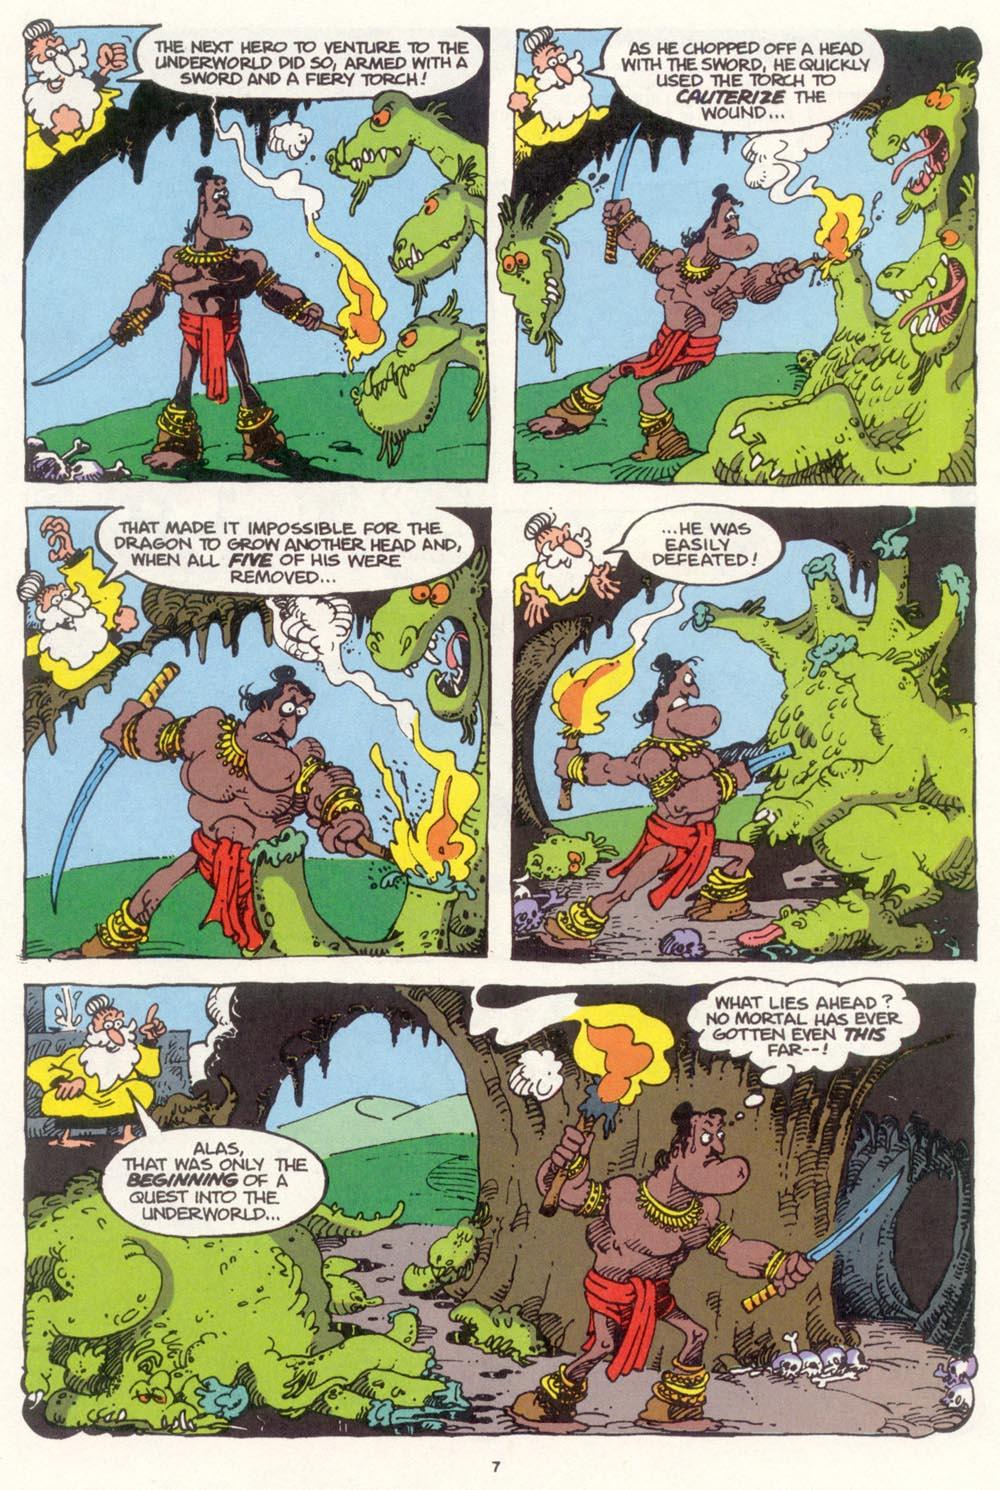 Read online Sergio Aragonés Groo the Wanderer comic -  Issue #99 - 8